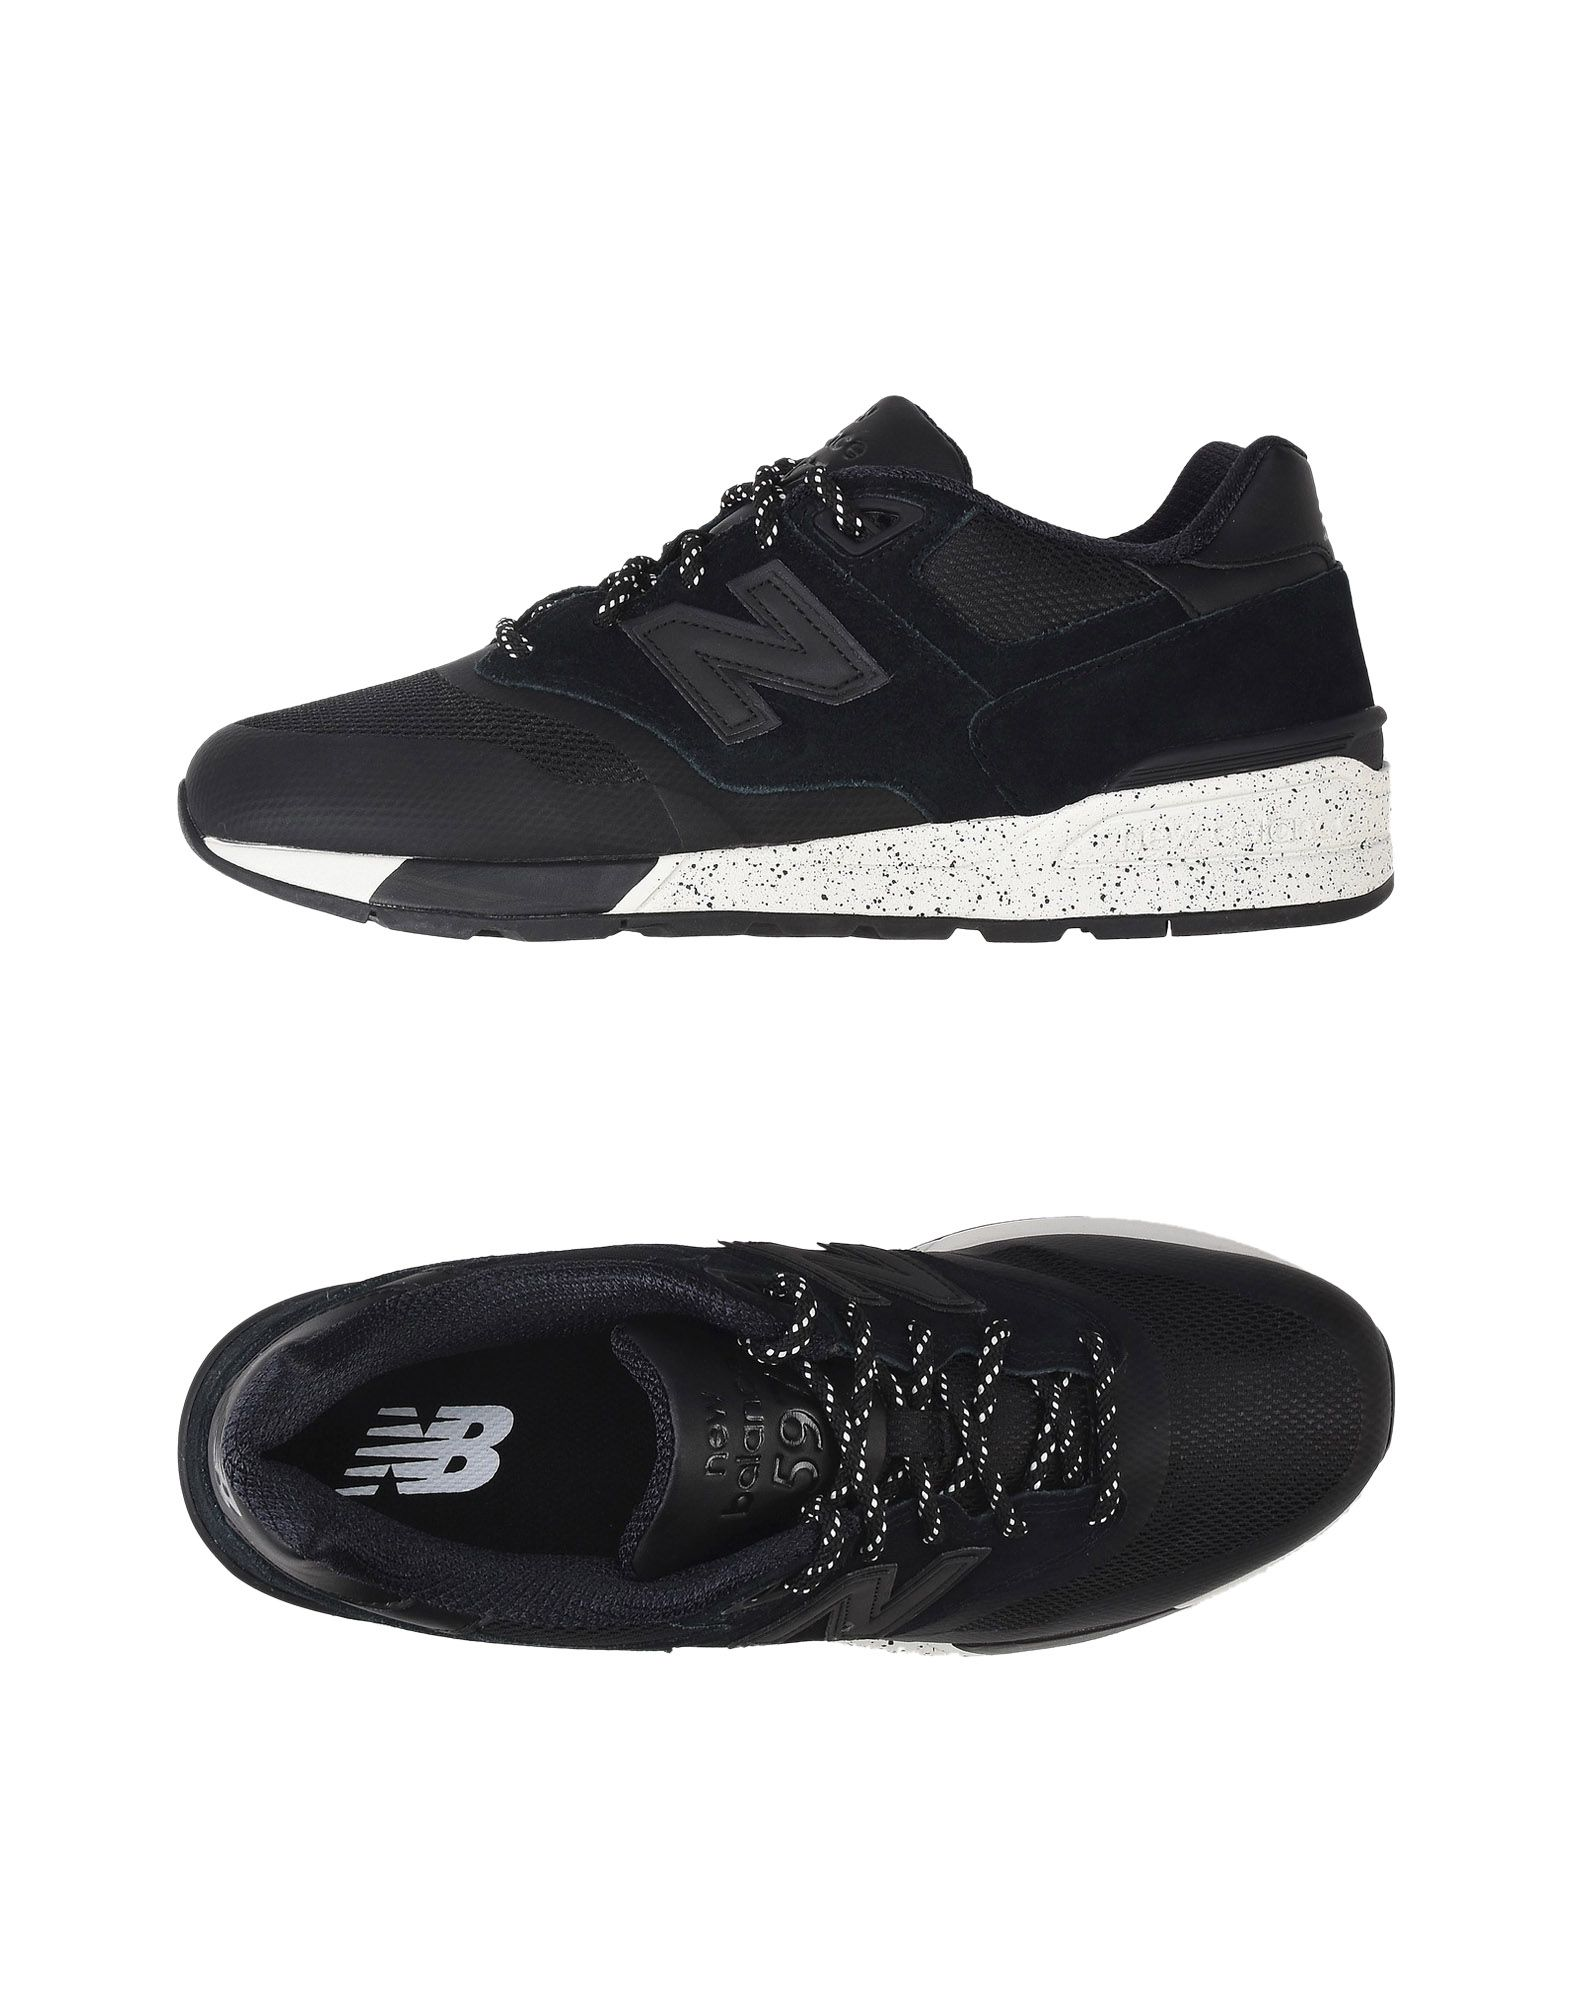 Sneakers New Balance 597 Outdoor Pack - Uomo - Acquista online su